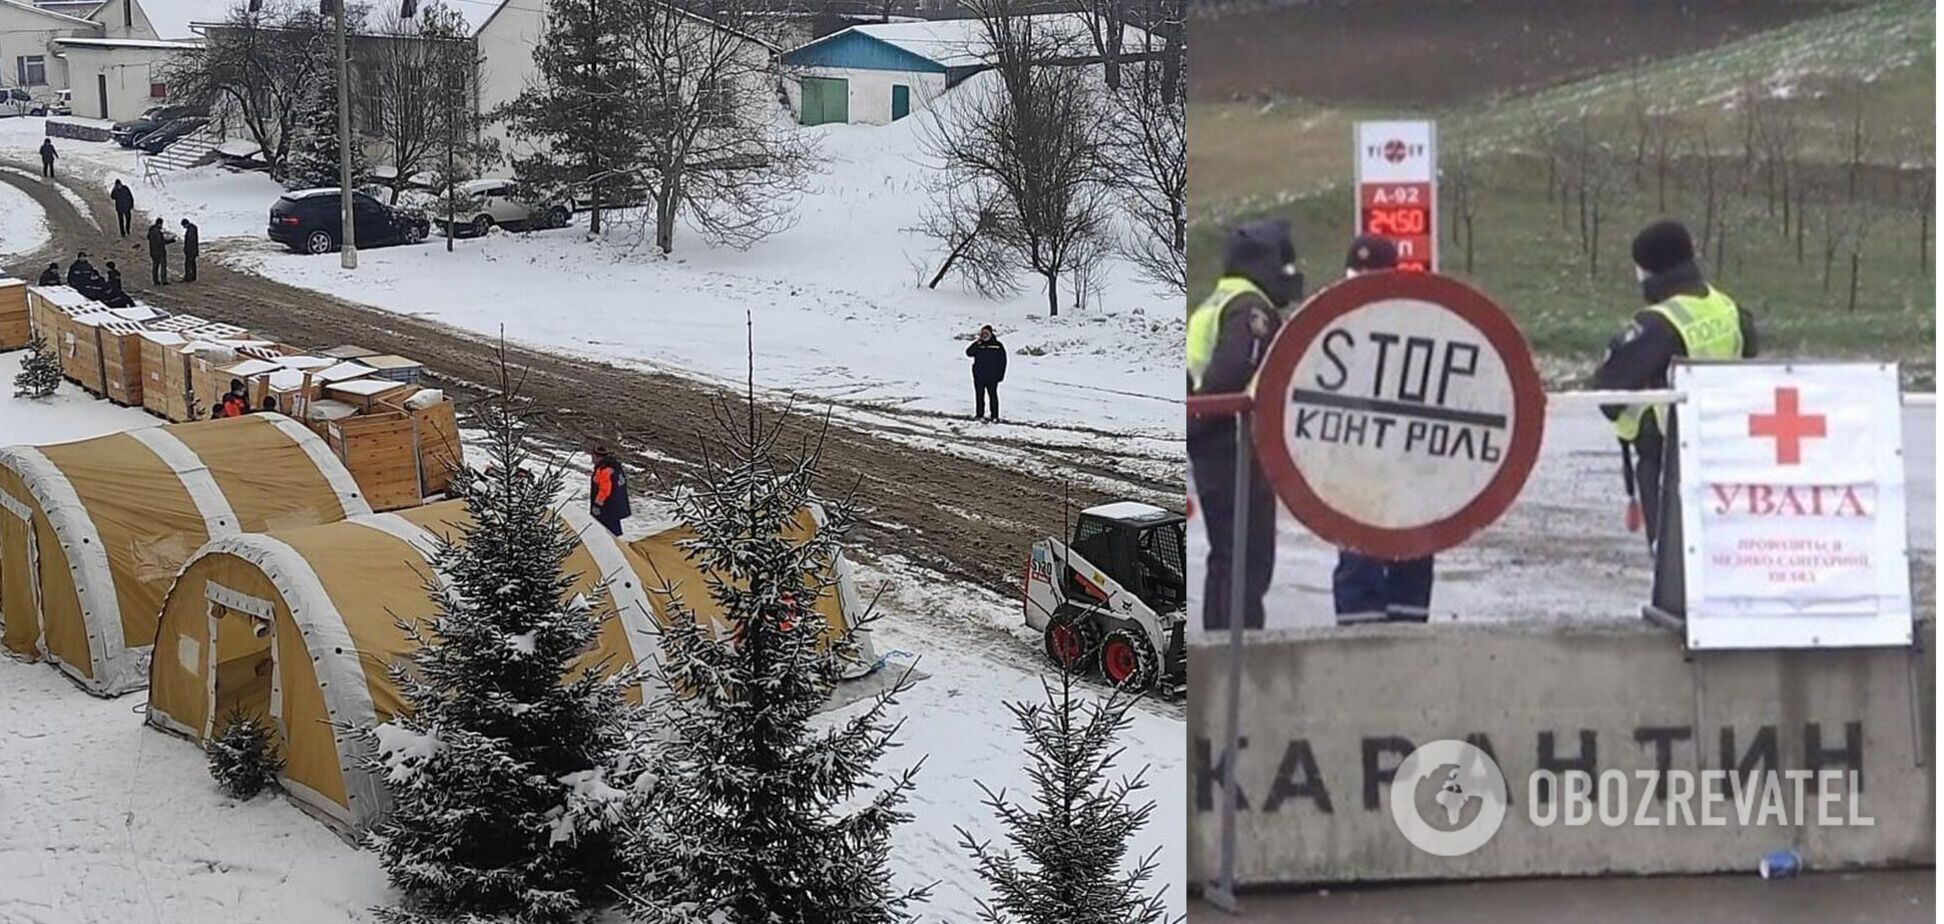 Ивано-Франковщину оградили блокпостами из-за вспышки коронавируса. Список дорог